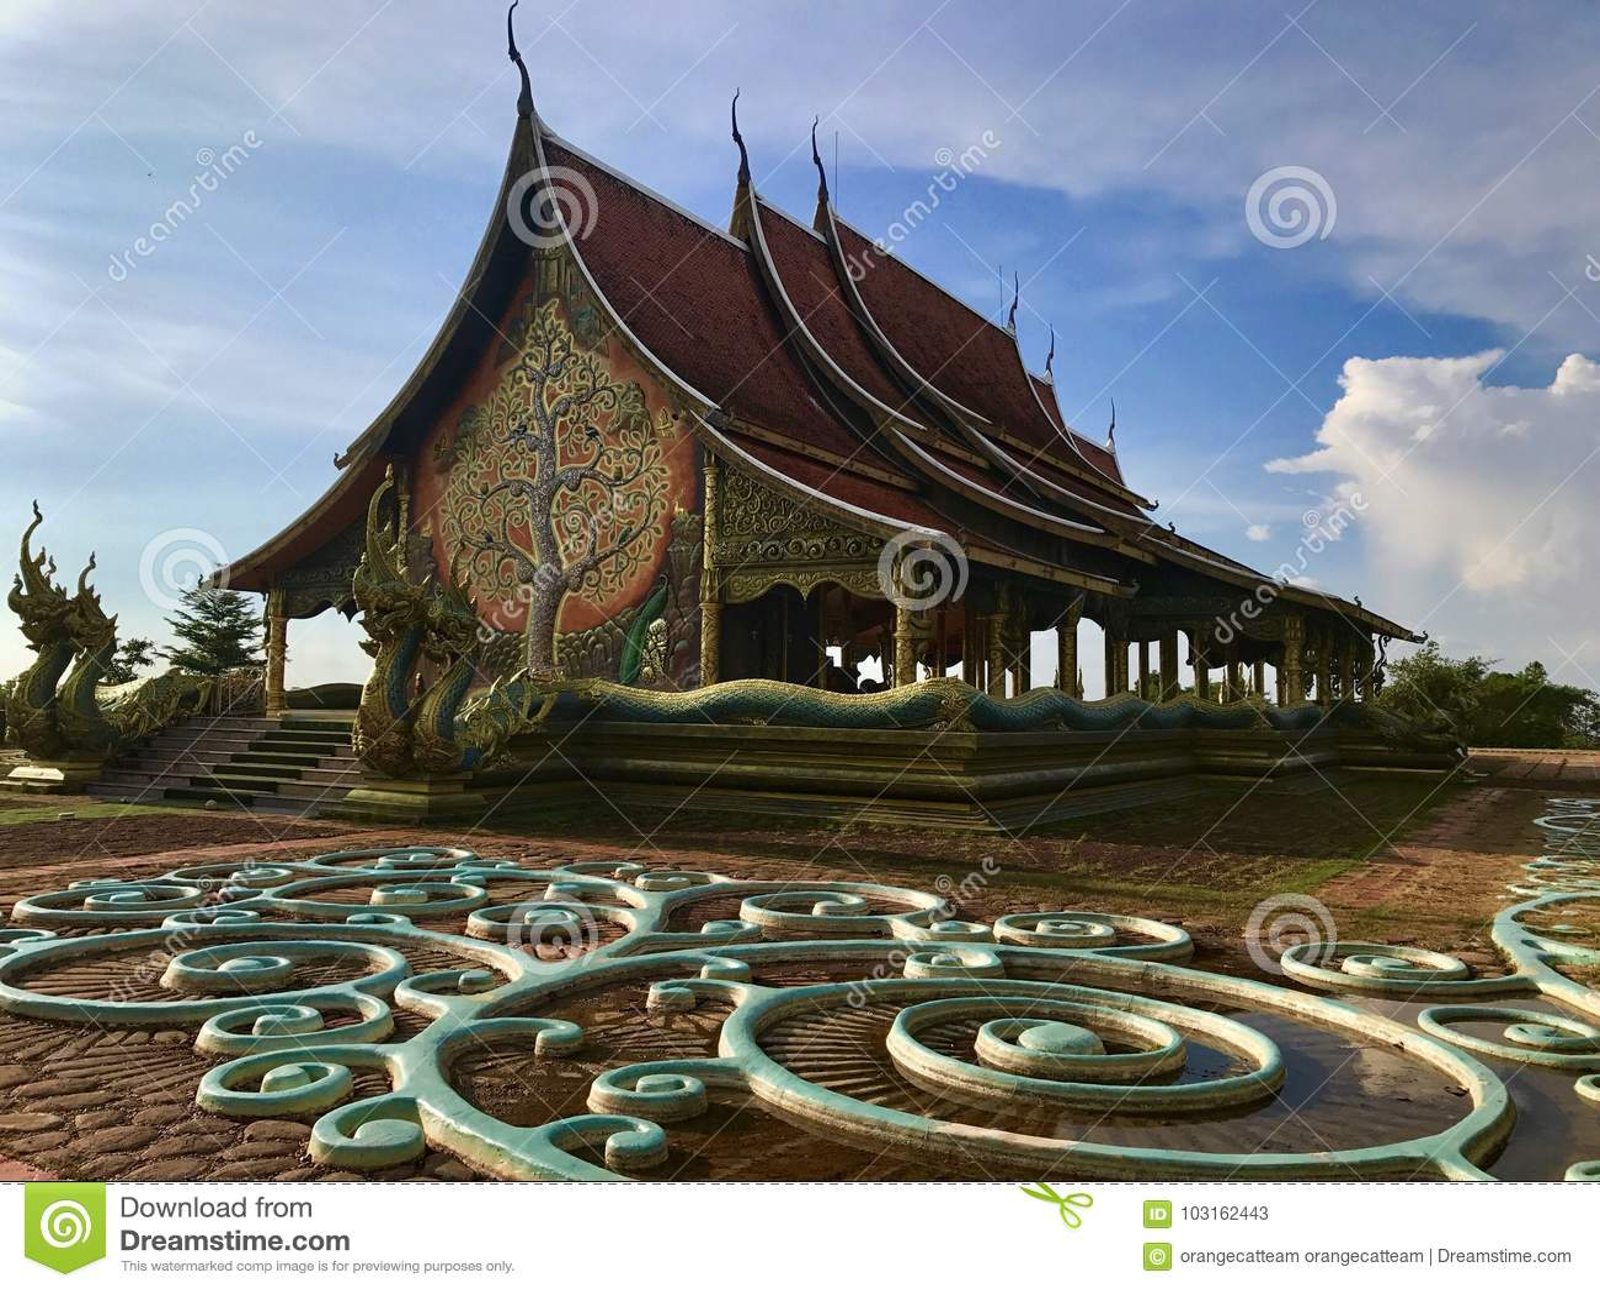 Watsirindhornwararam Ubon Ratchathani: Sep 2017 - de tempel van de kleine tempel